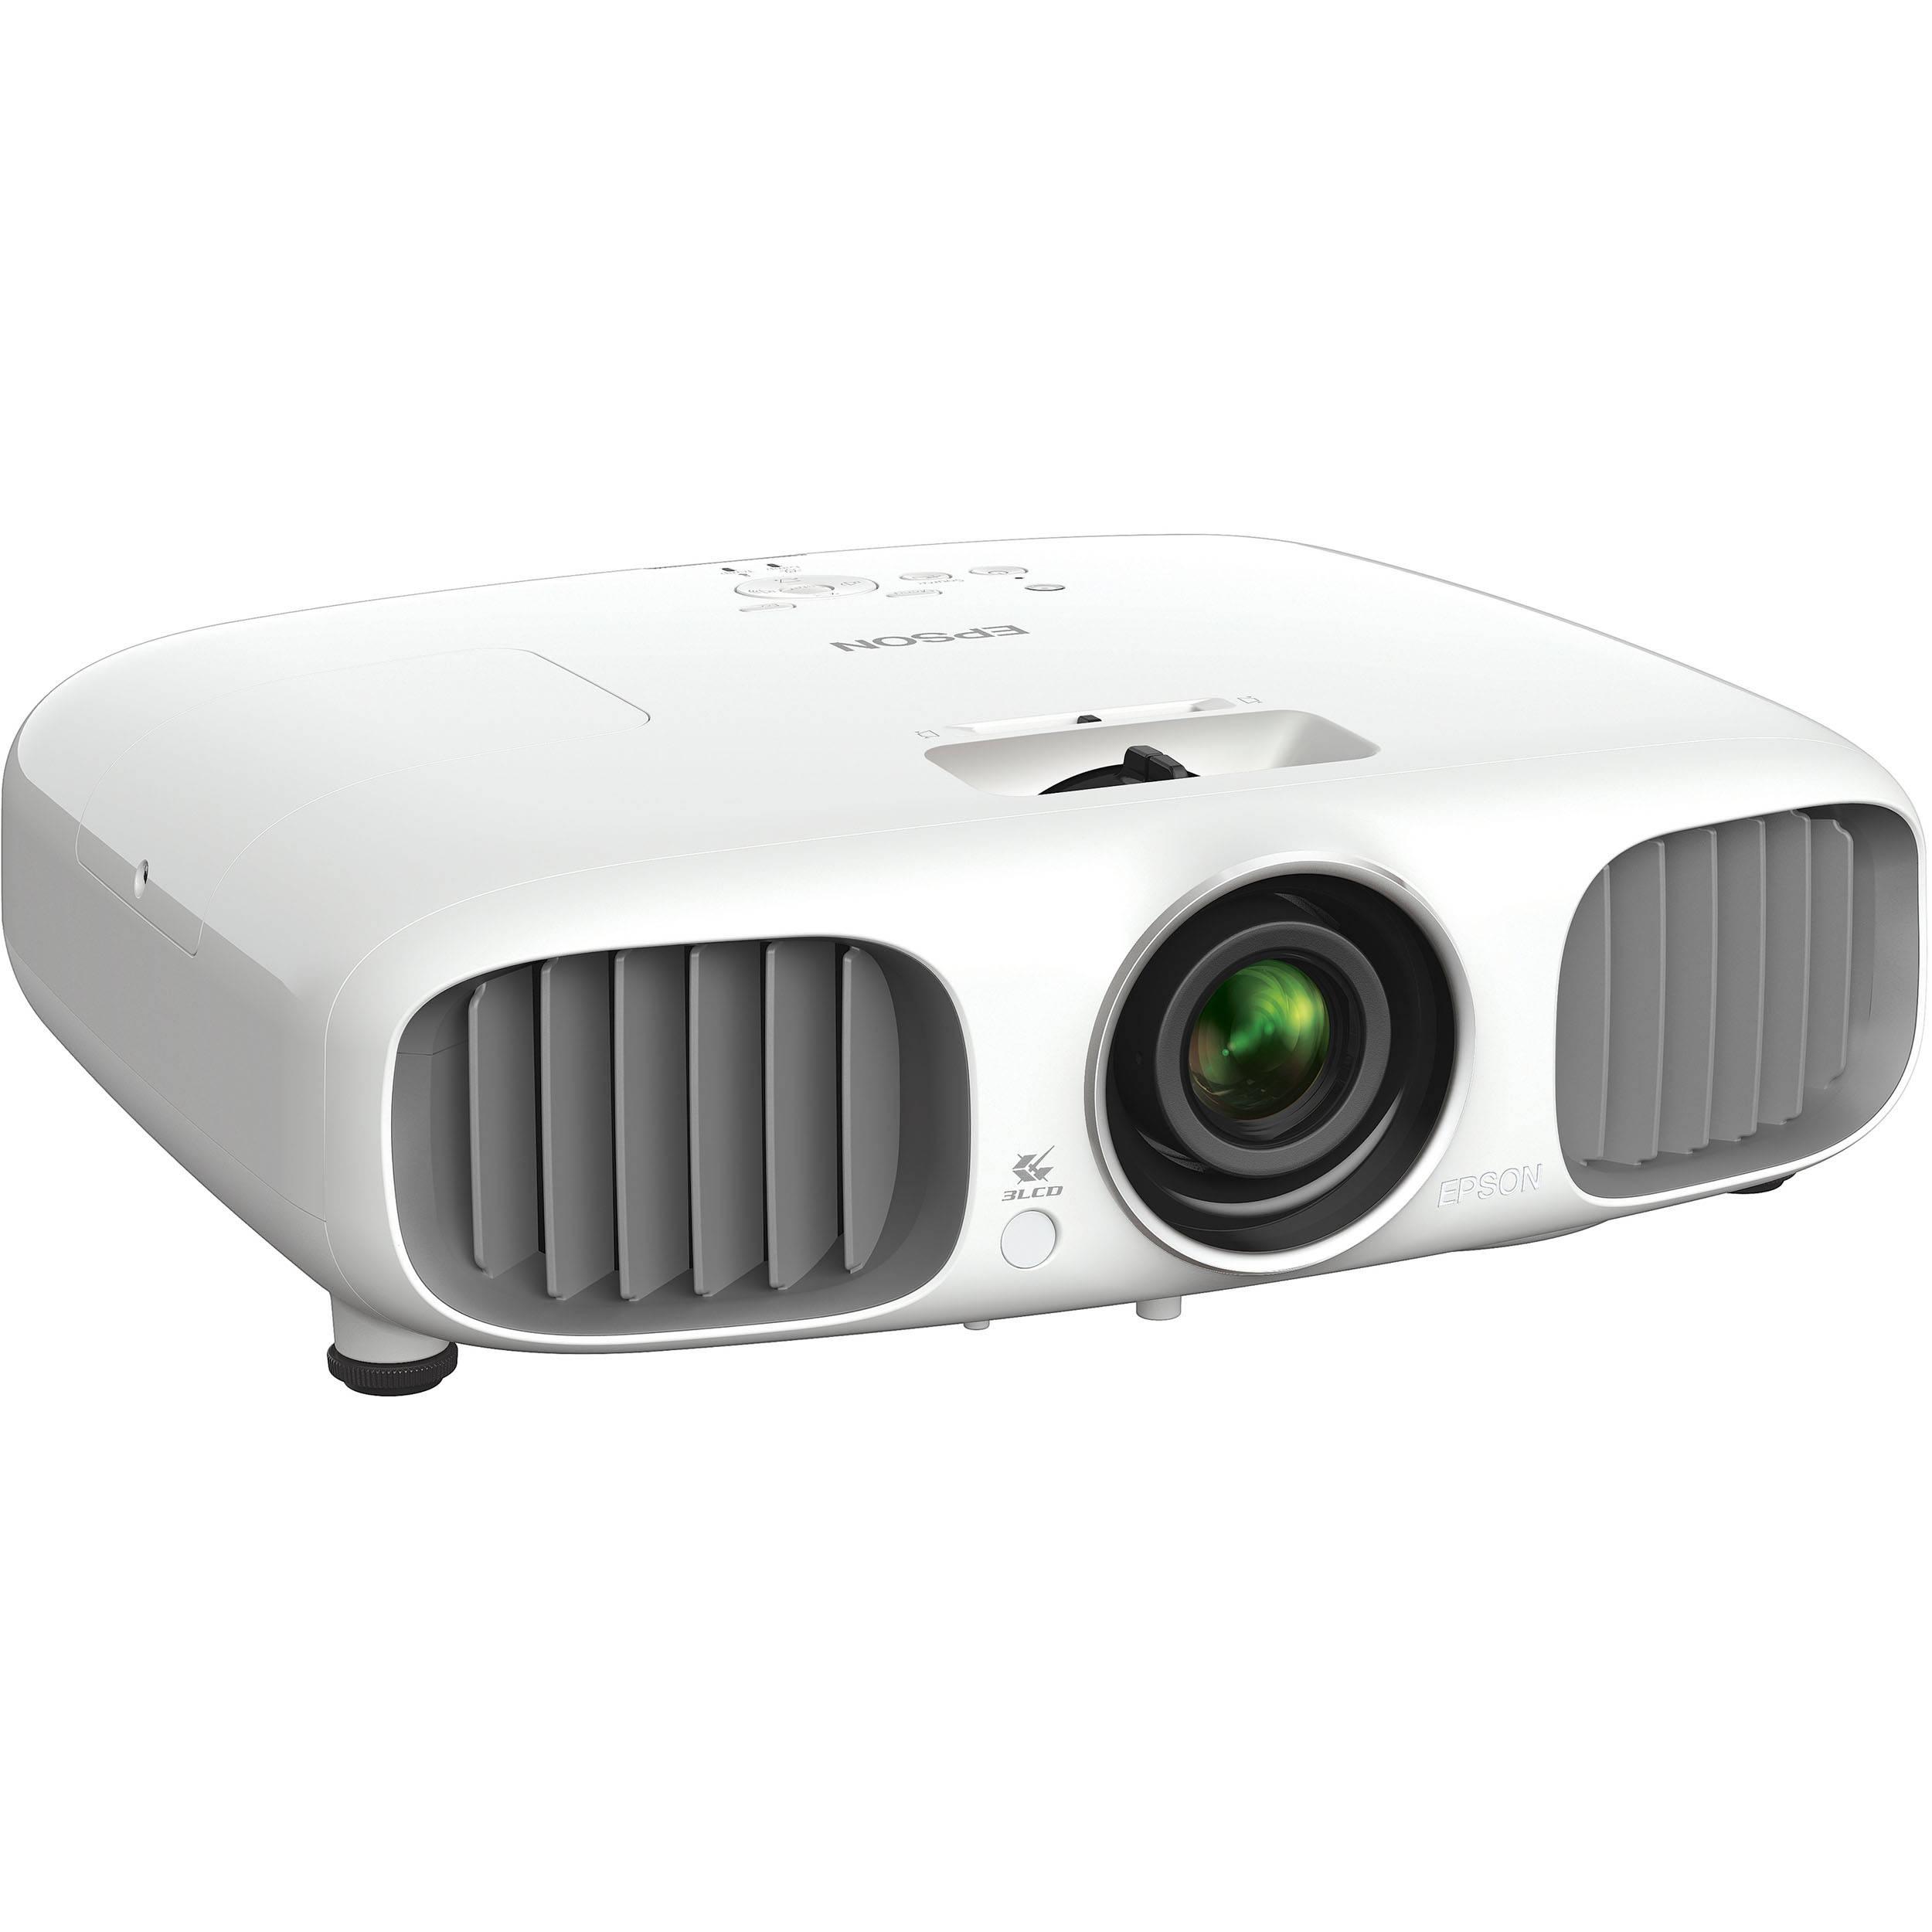 epson powerlite home cinema 3010 projector v11h421020 b h photo rh bhphotovideo com Epson 905W Epson PowerLite 475W